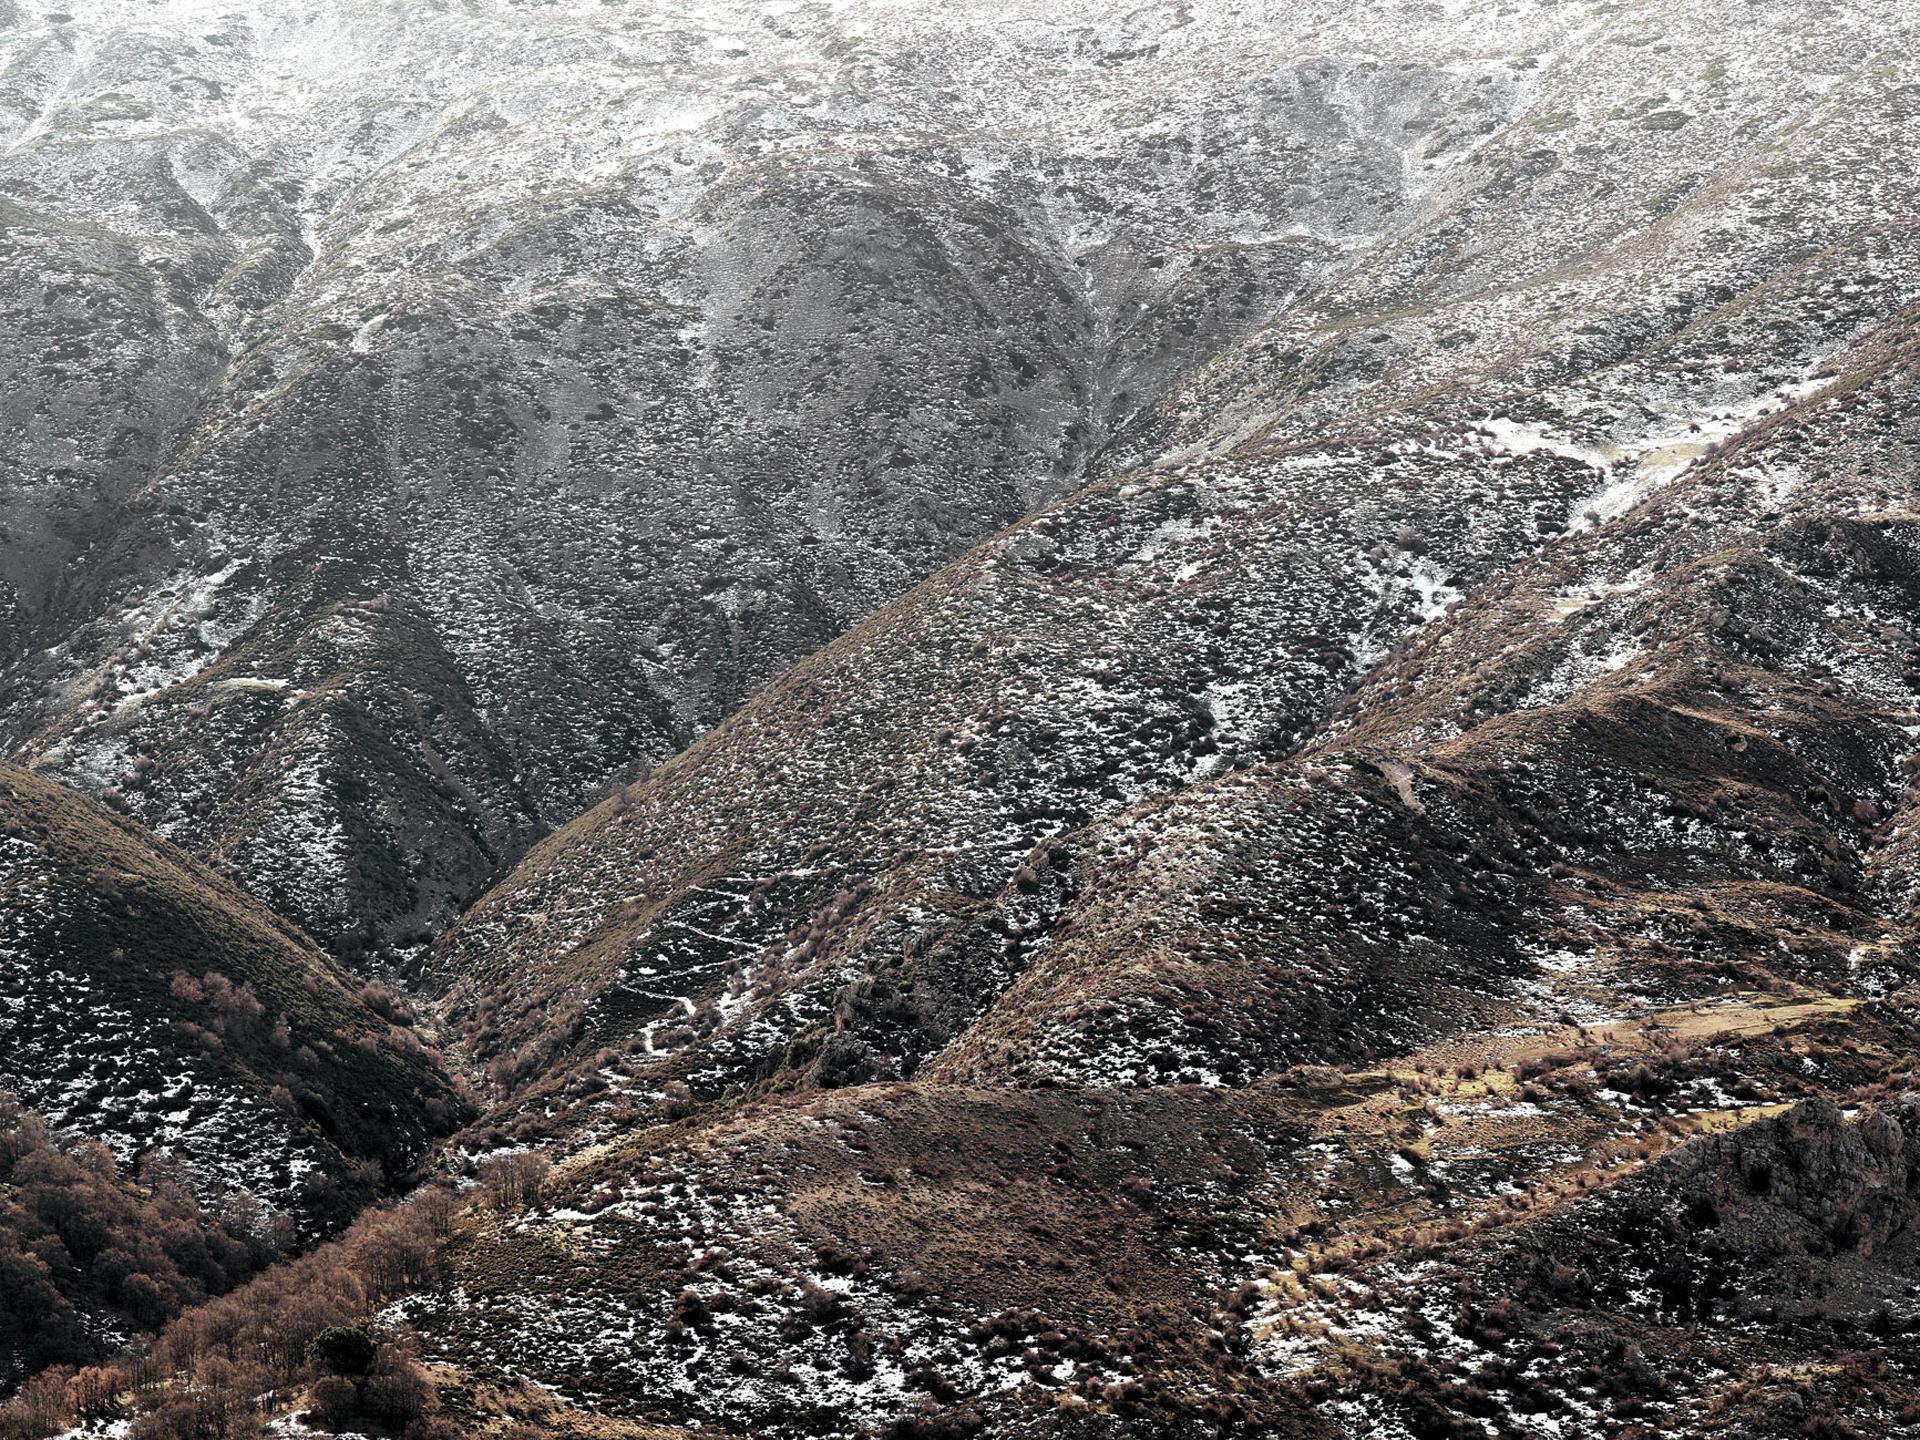 sierra nevada 0036, landscape, personal work, mountain, www.ankeluckmann.com, anke luckmann, snow